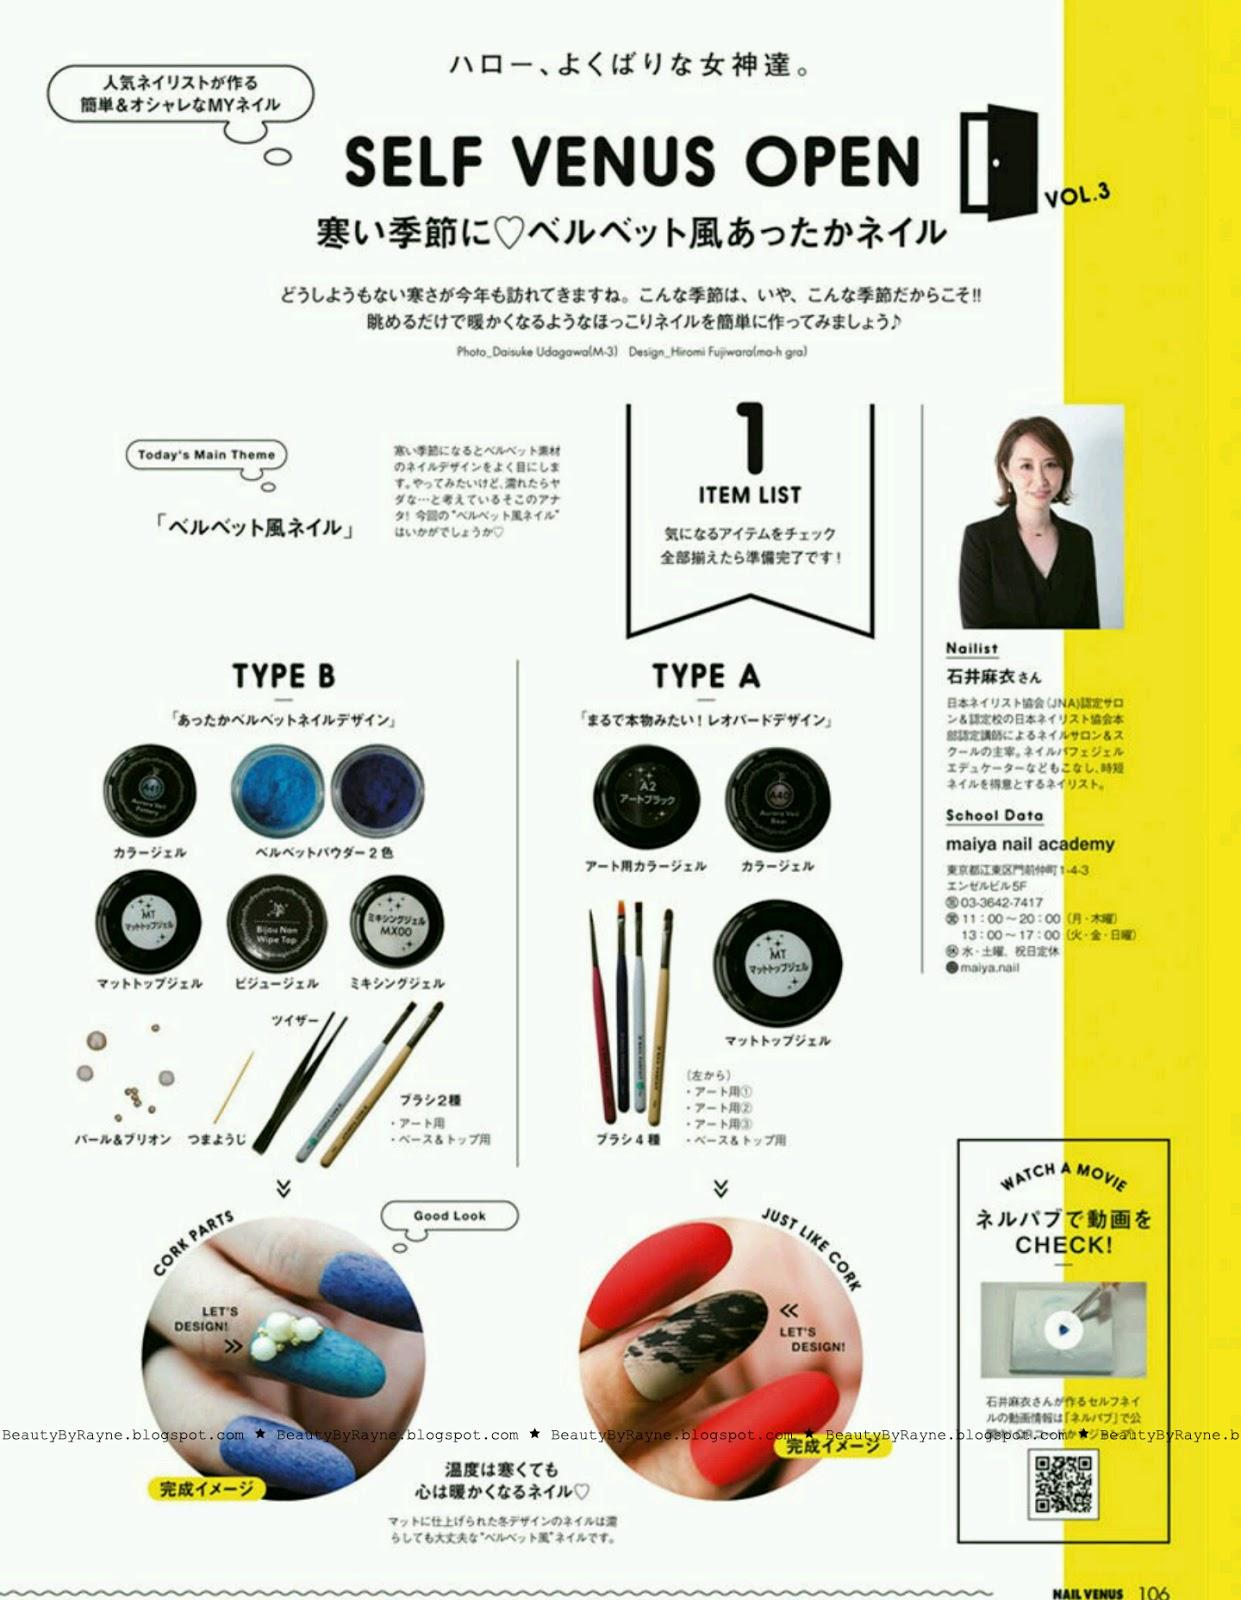 Nail Venus Winter 2018 Issue, Free Japanese Fashion Magazine Scans